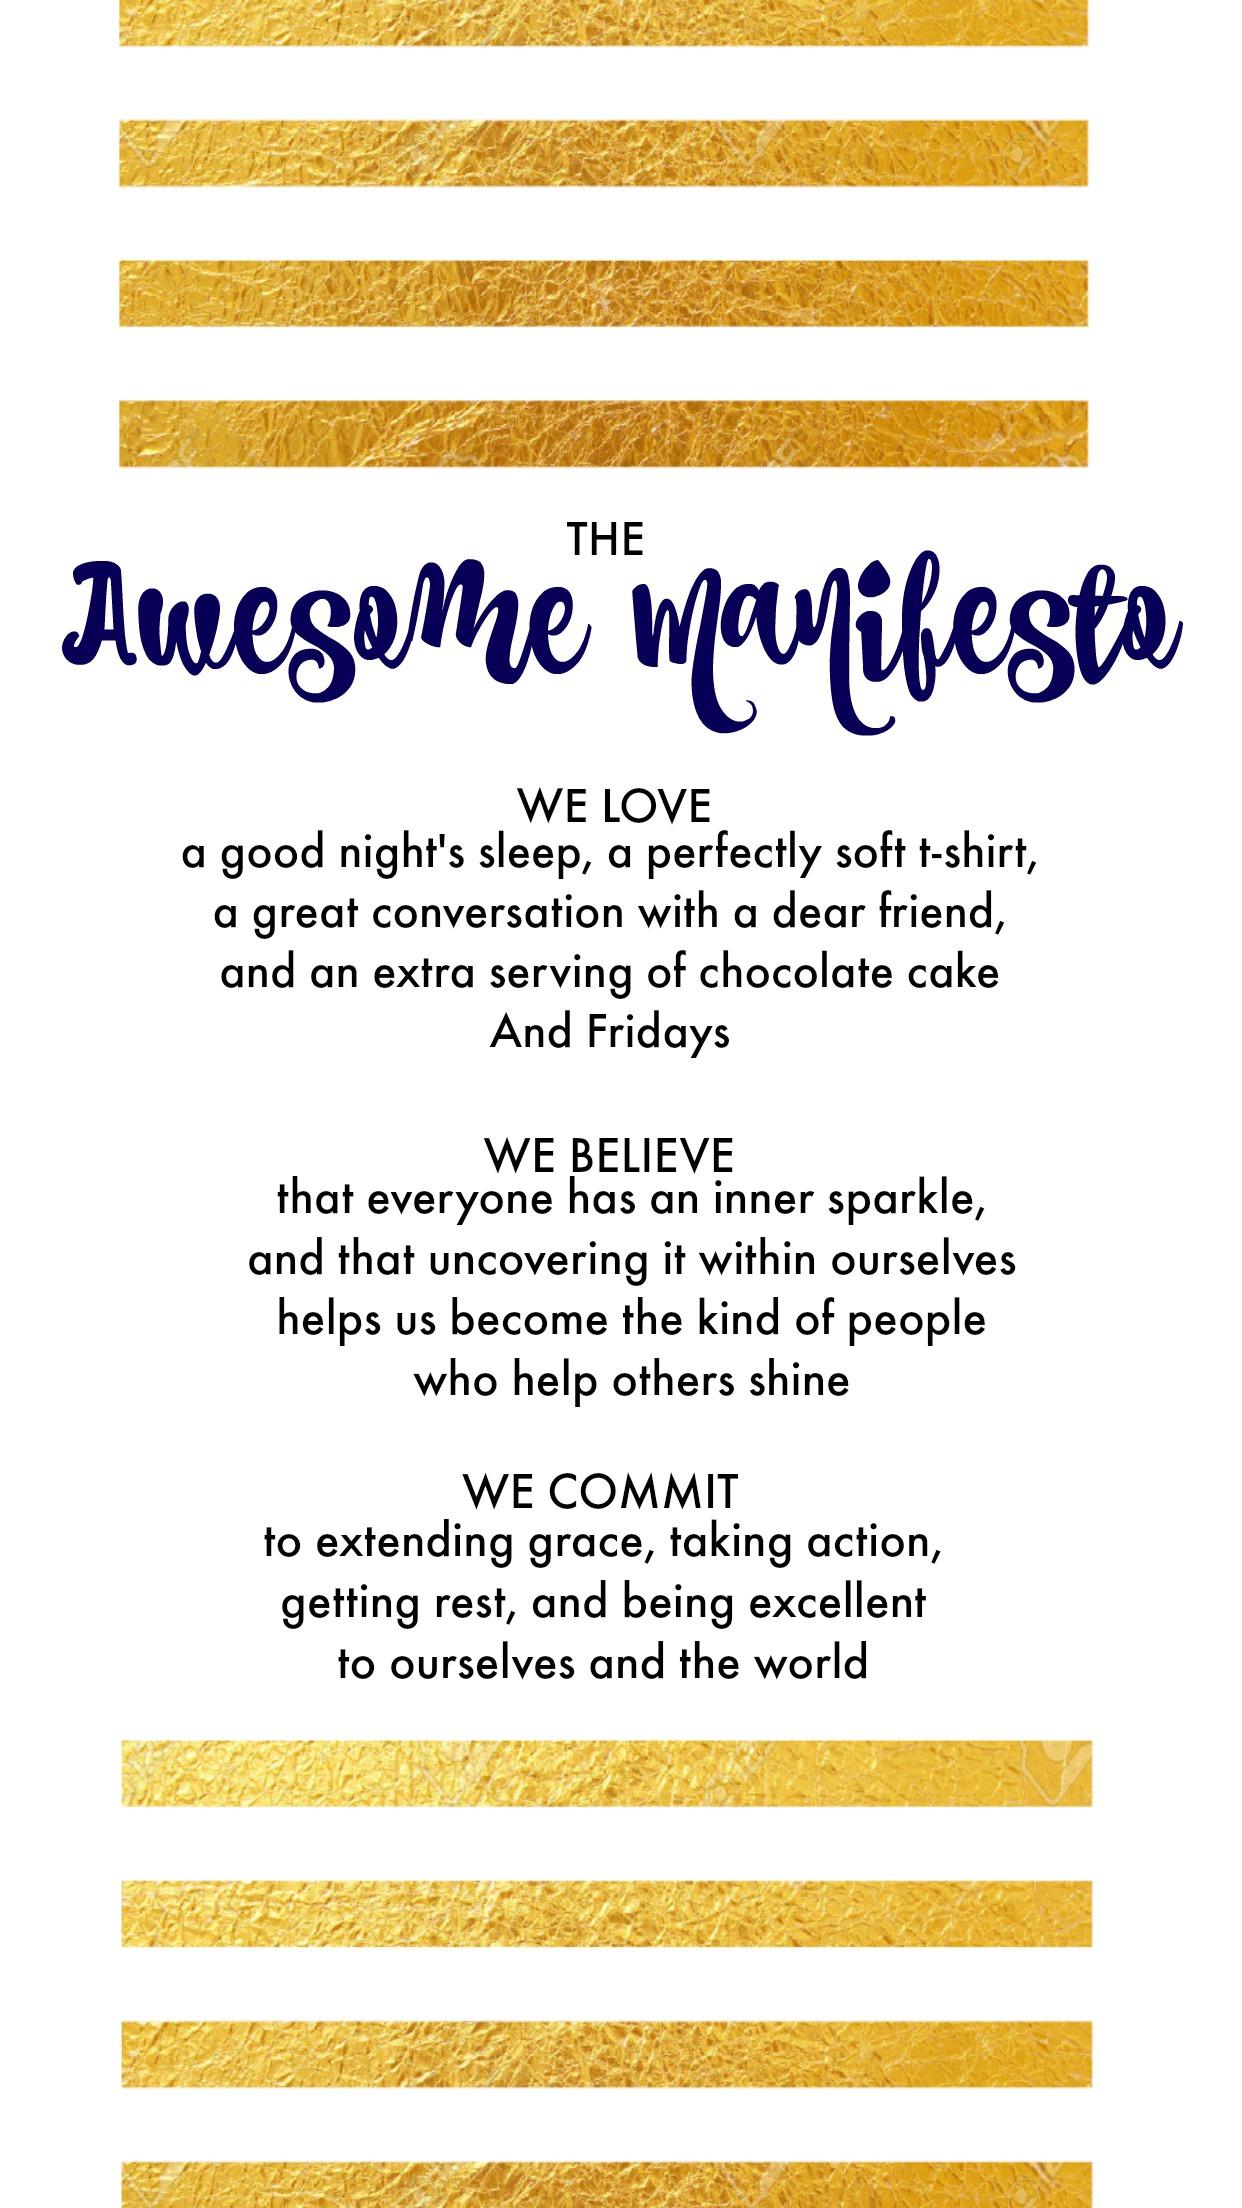 Awesome Manifesto Gold.jpg